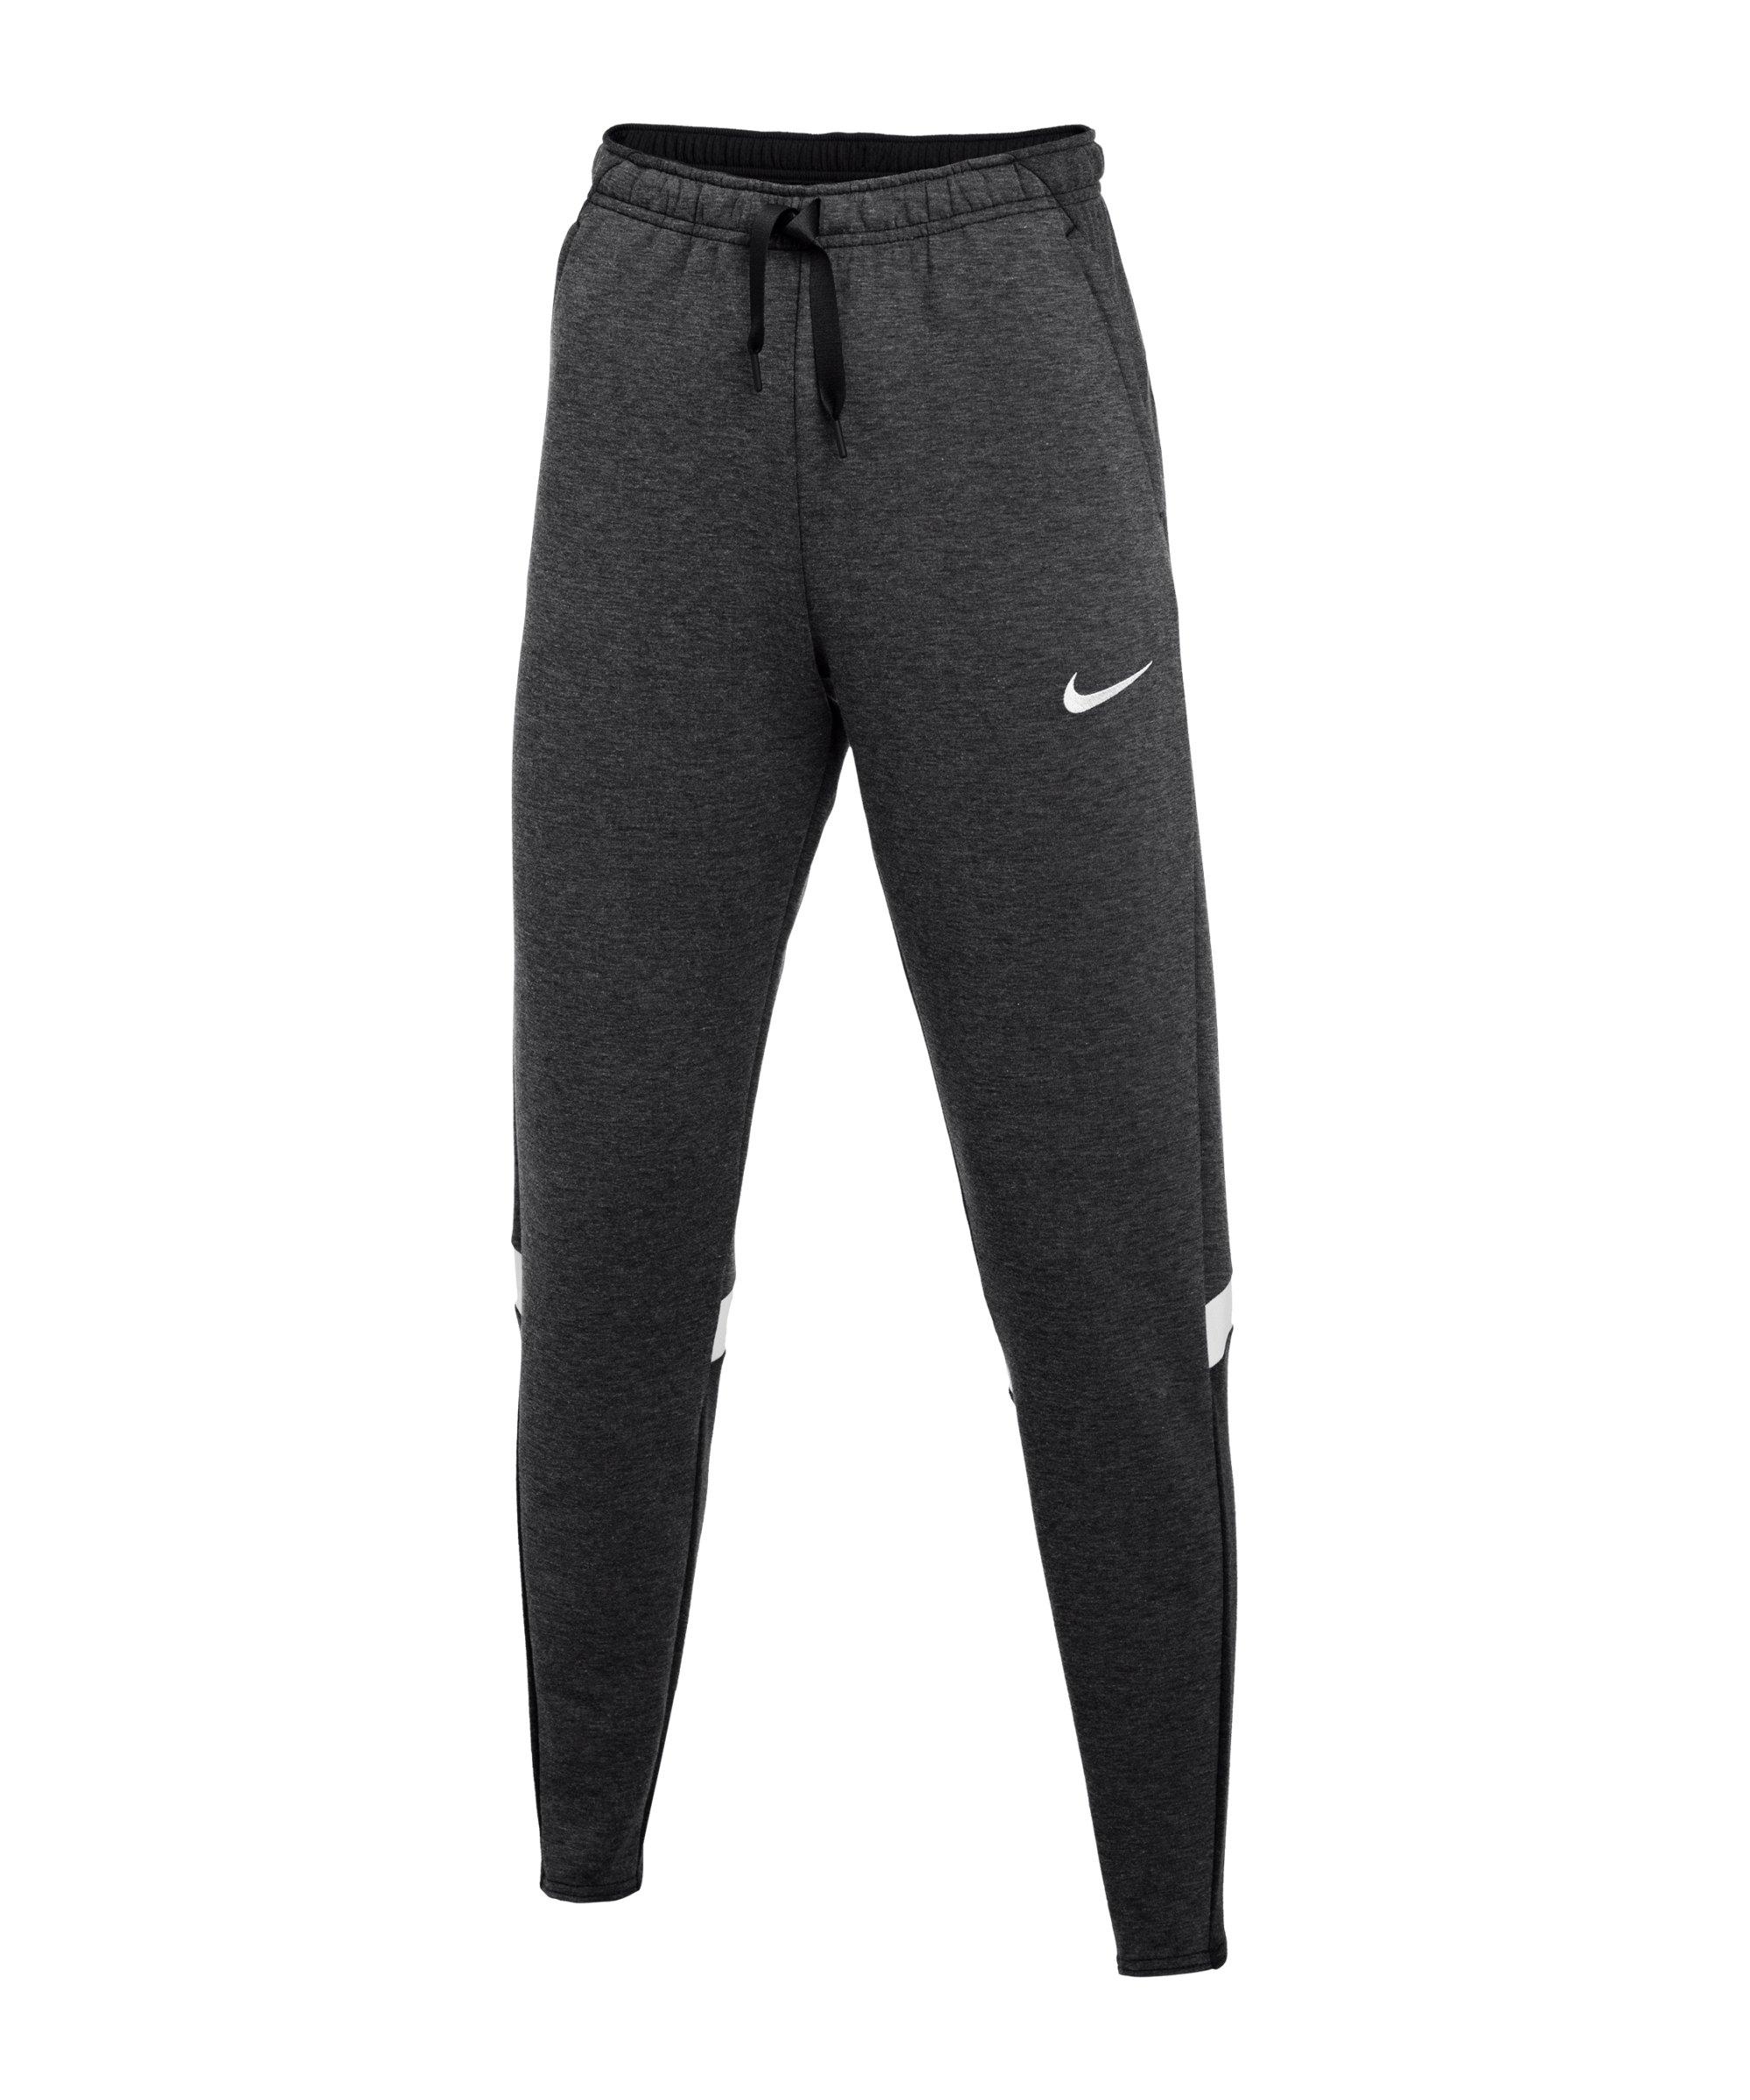 Nike Strike 21 Fleece Trainingshose Schwarz F011 - grau